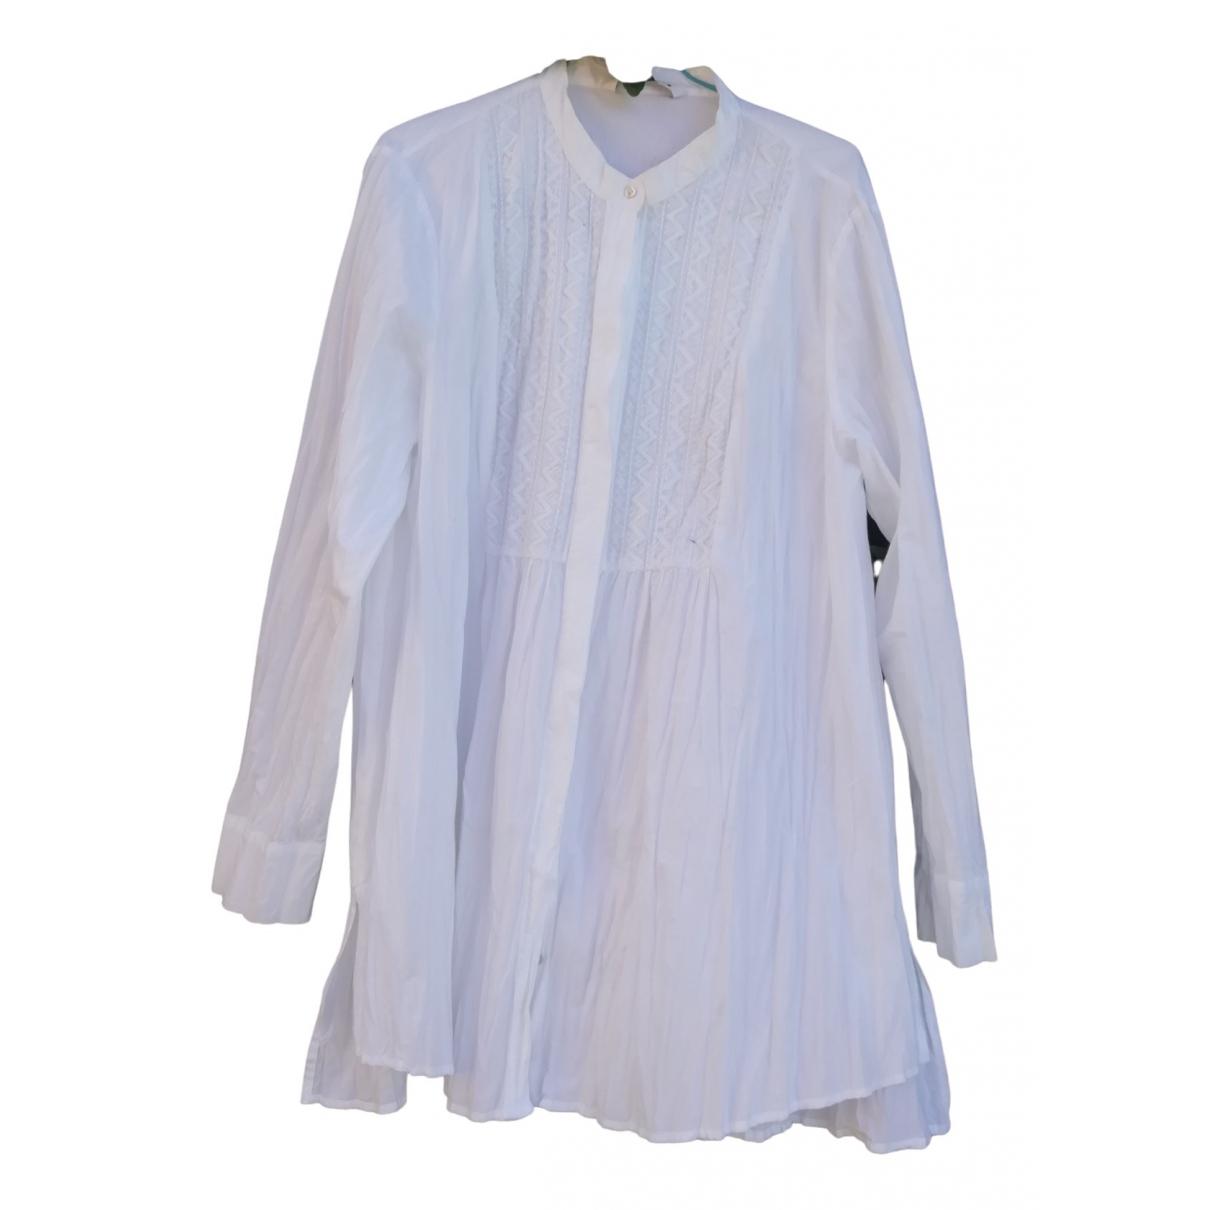 Zara \N White  top for Women L International